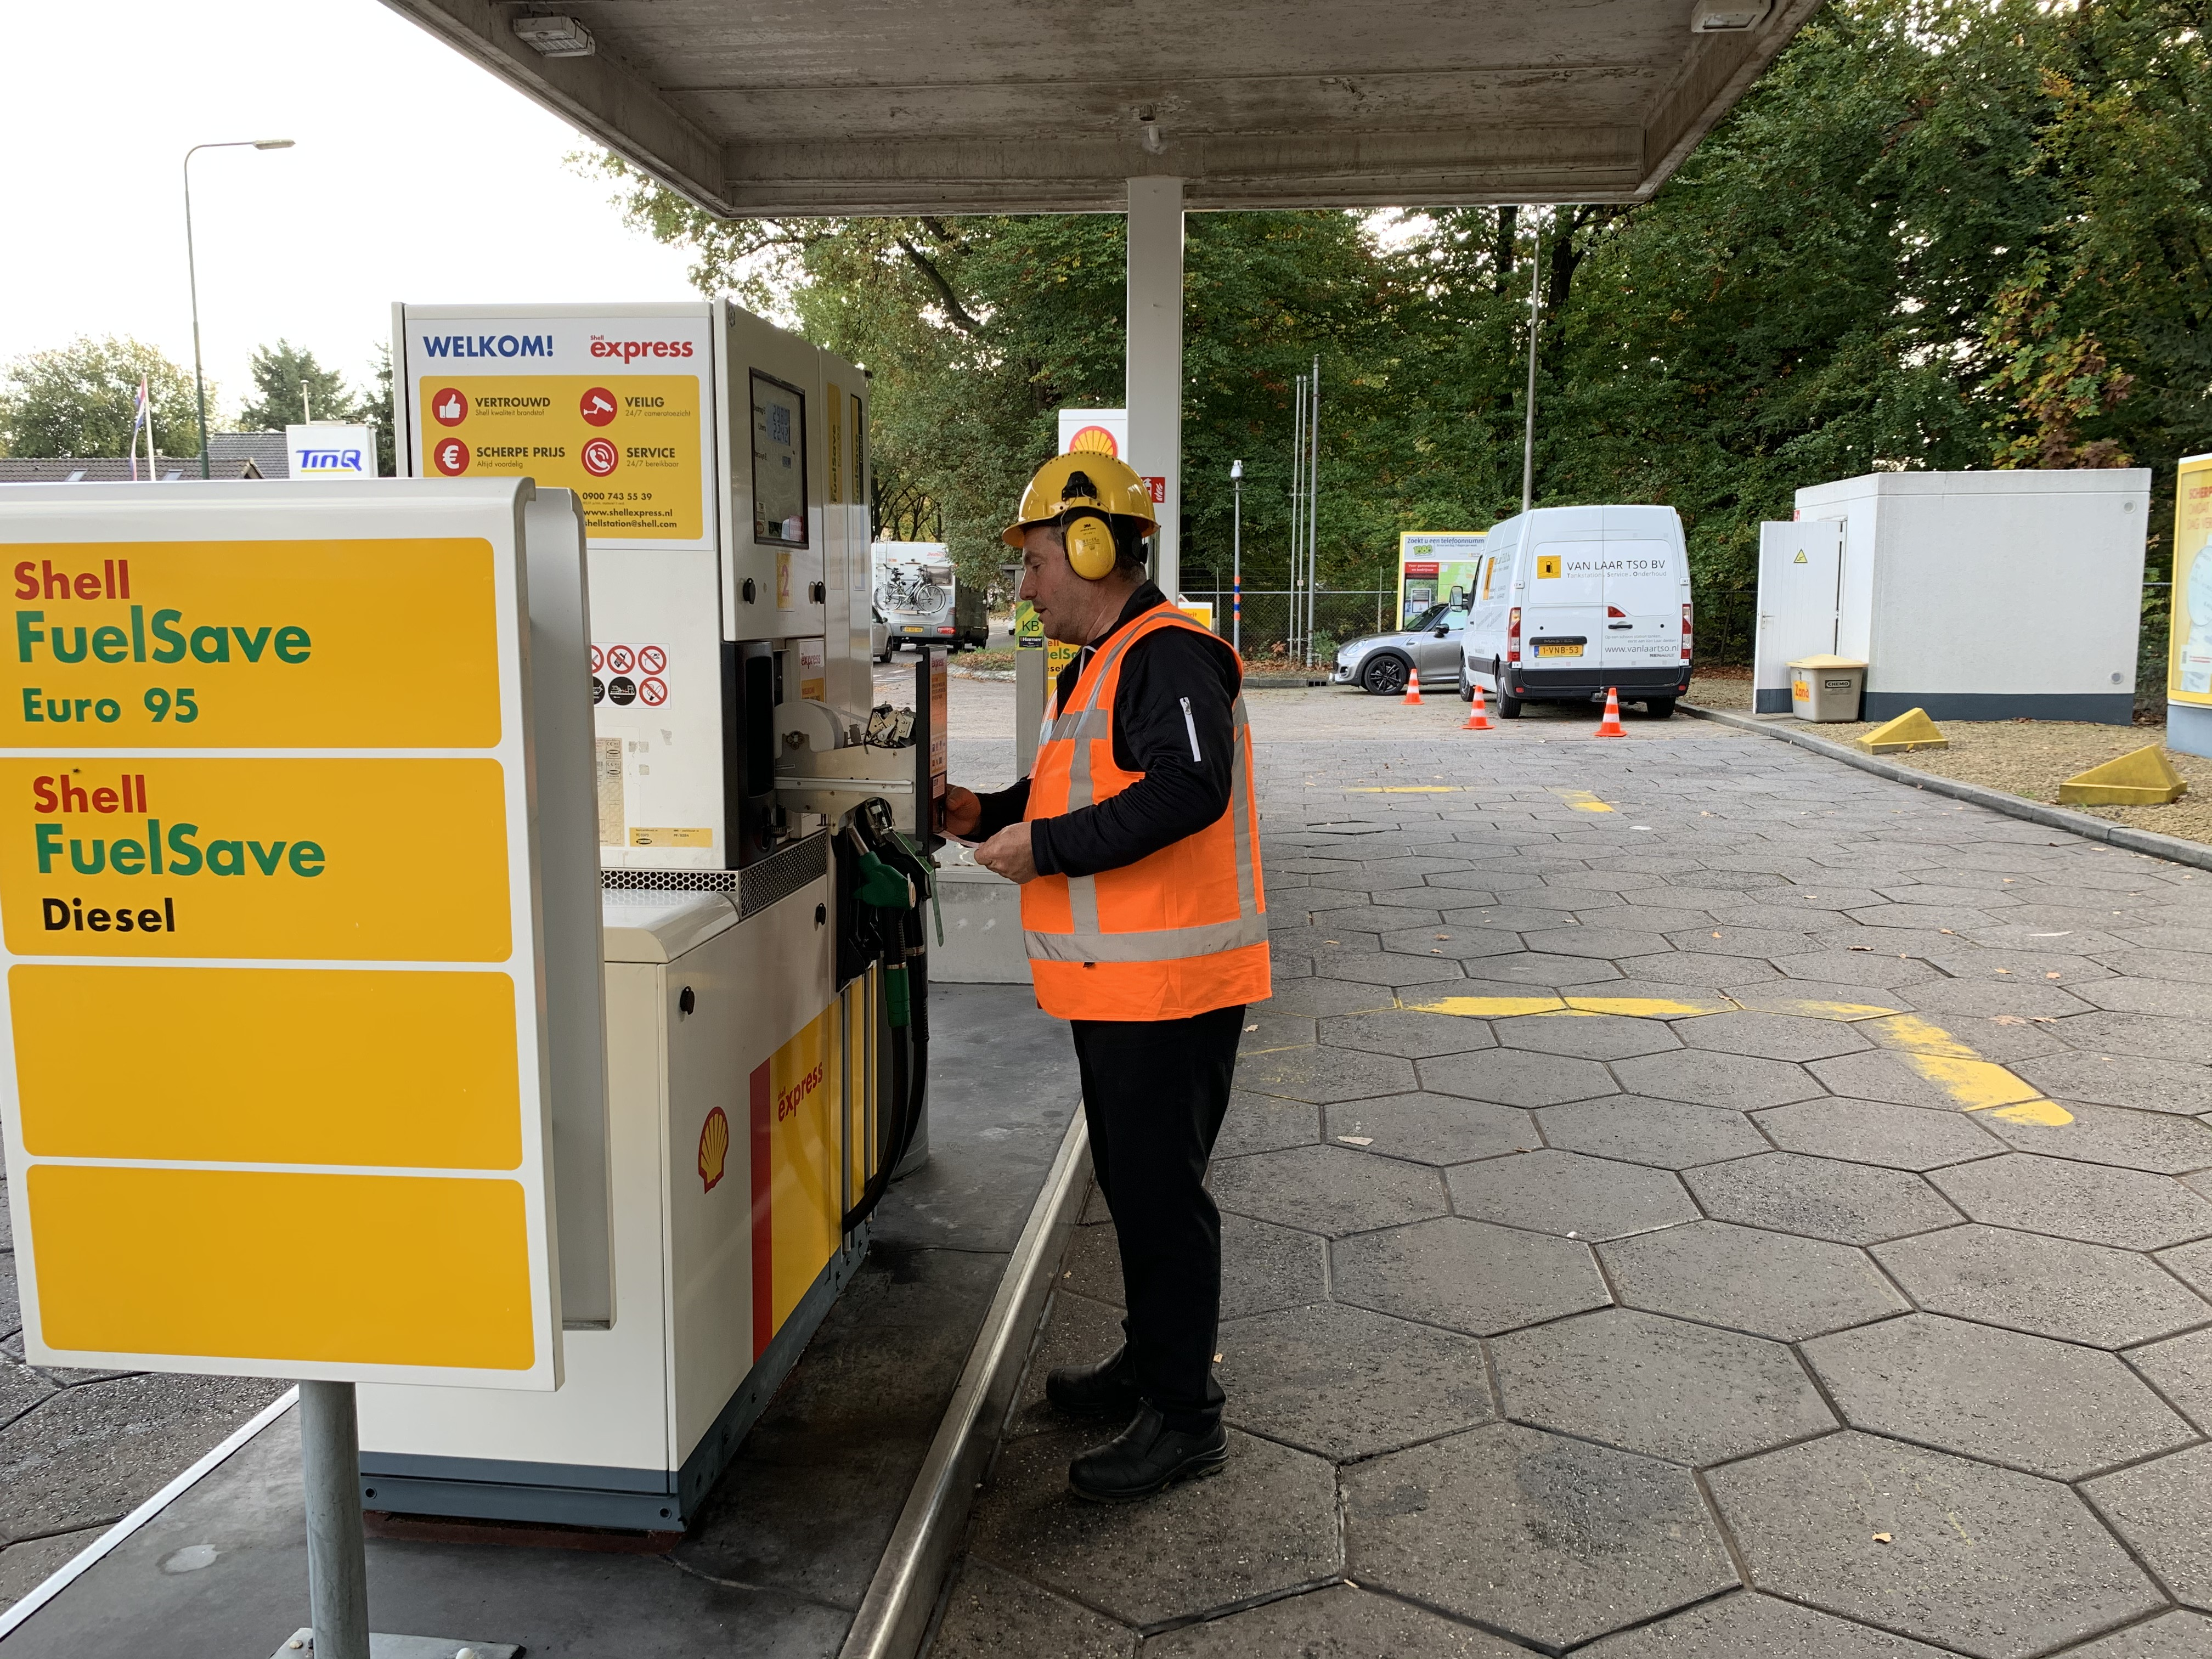 Bonrol vervangen Shell Express